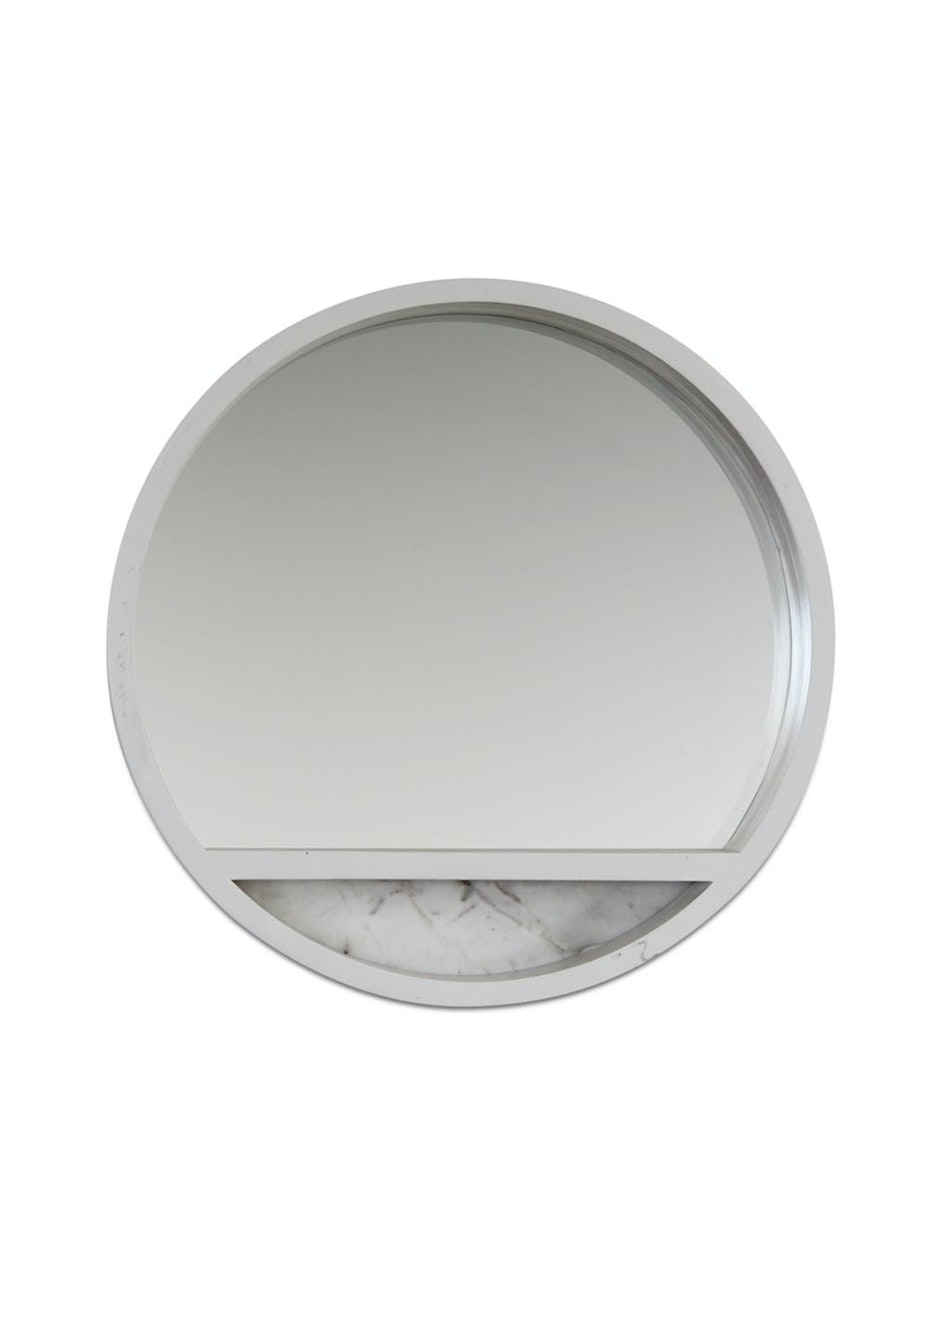 Me & My Trend - White Marble Panel Mirror